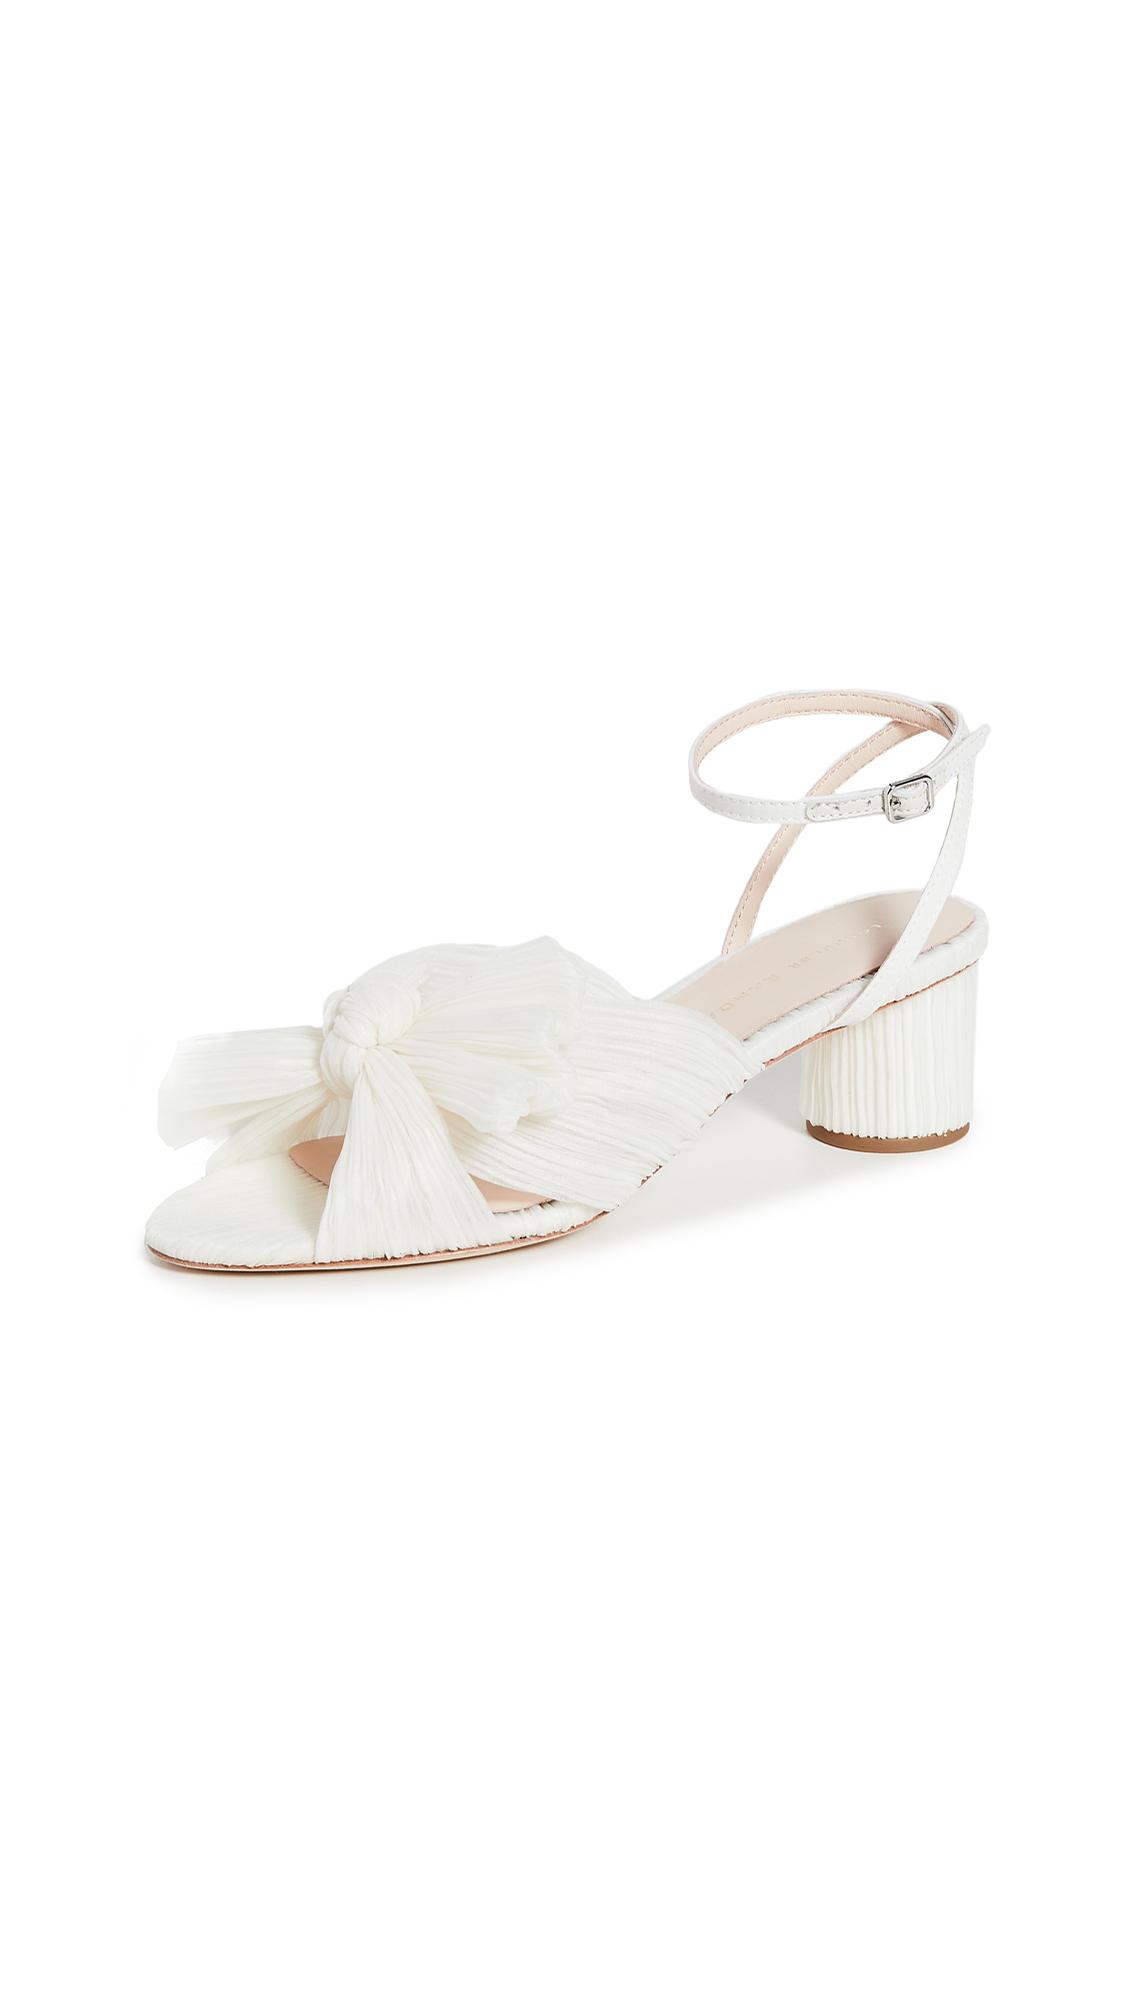 Buy Loeffler Randall Dahlia Knot Sandals online, shop Loeffler Randall